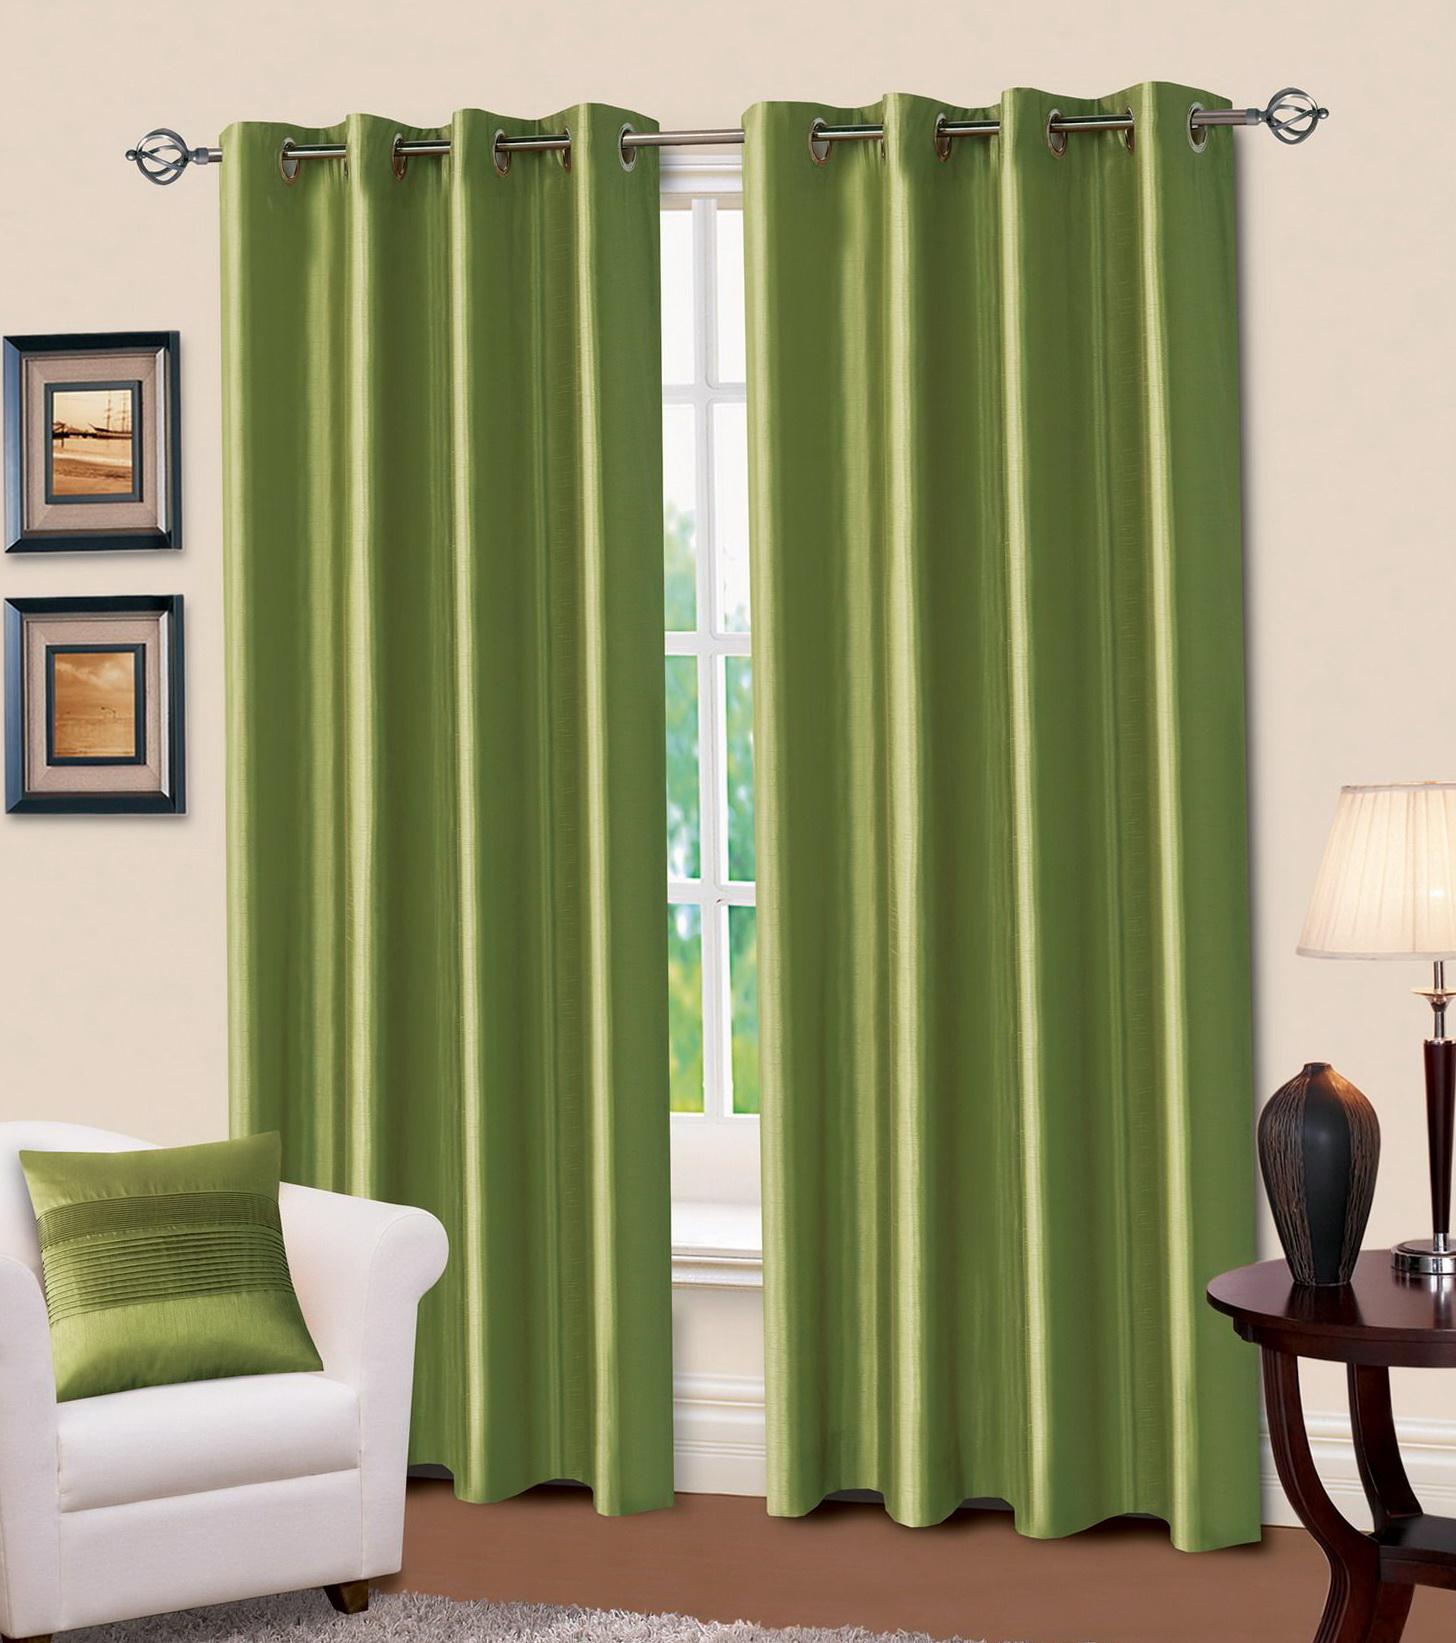 green blackout curtains uk home design ideas. Black Bedroom Furniture Sets. Home Design Ideas